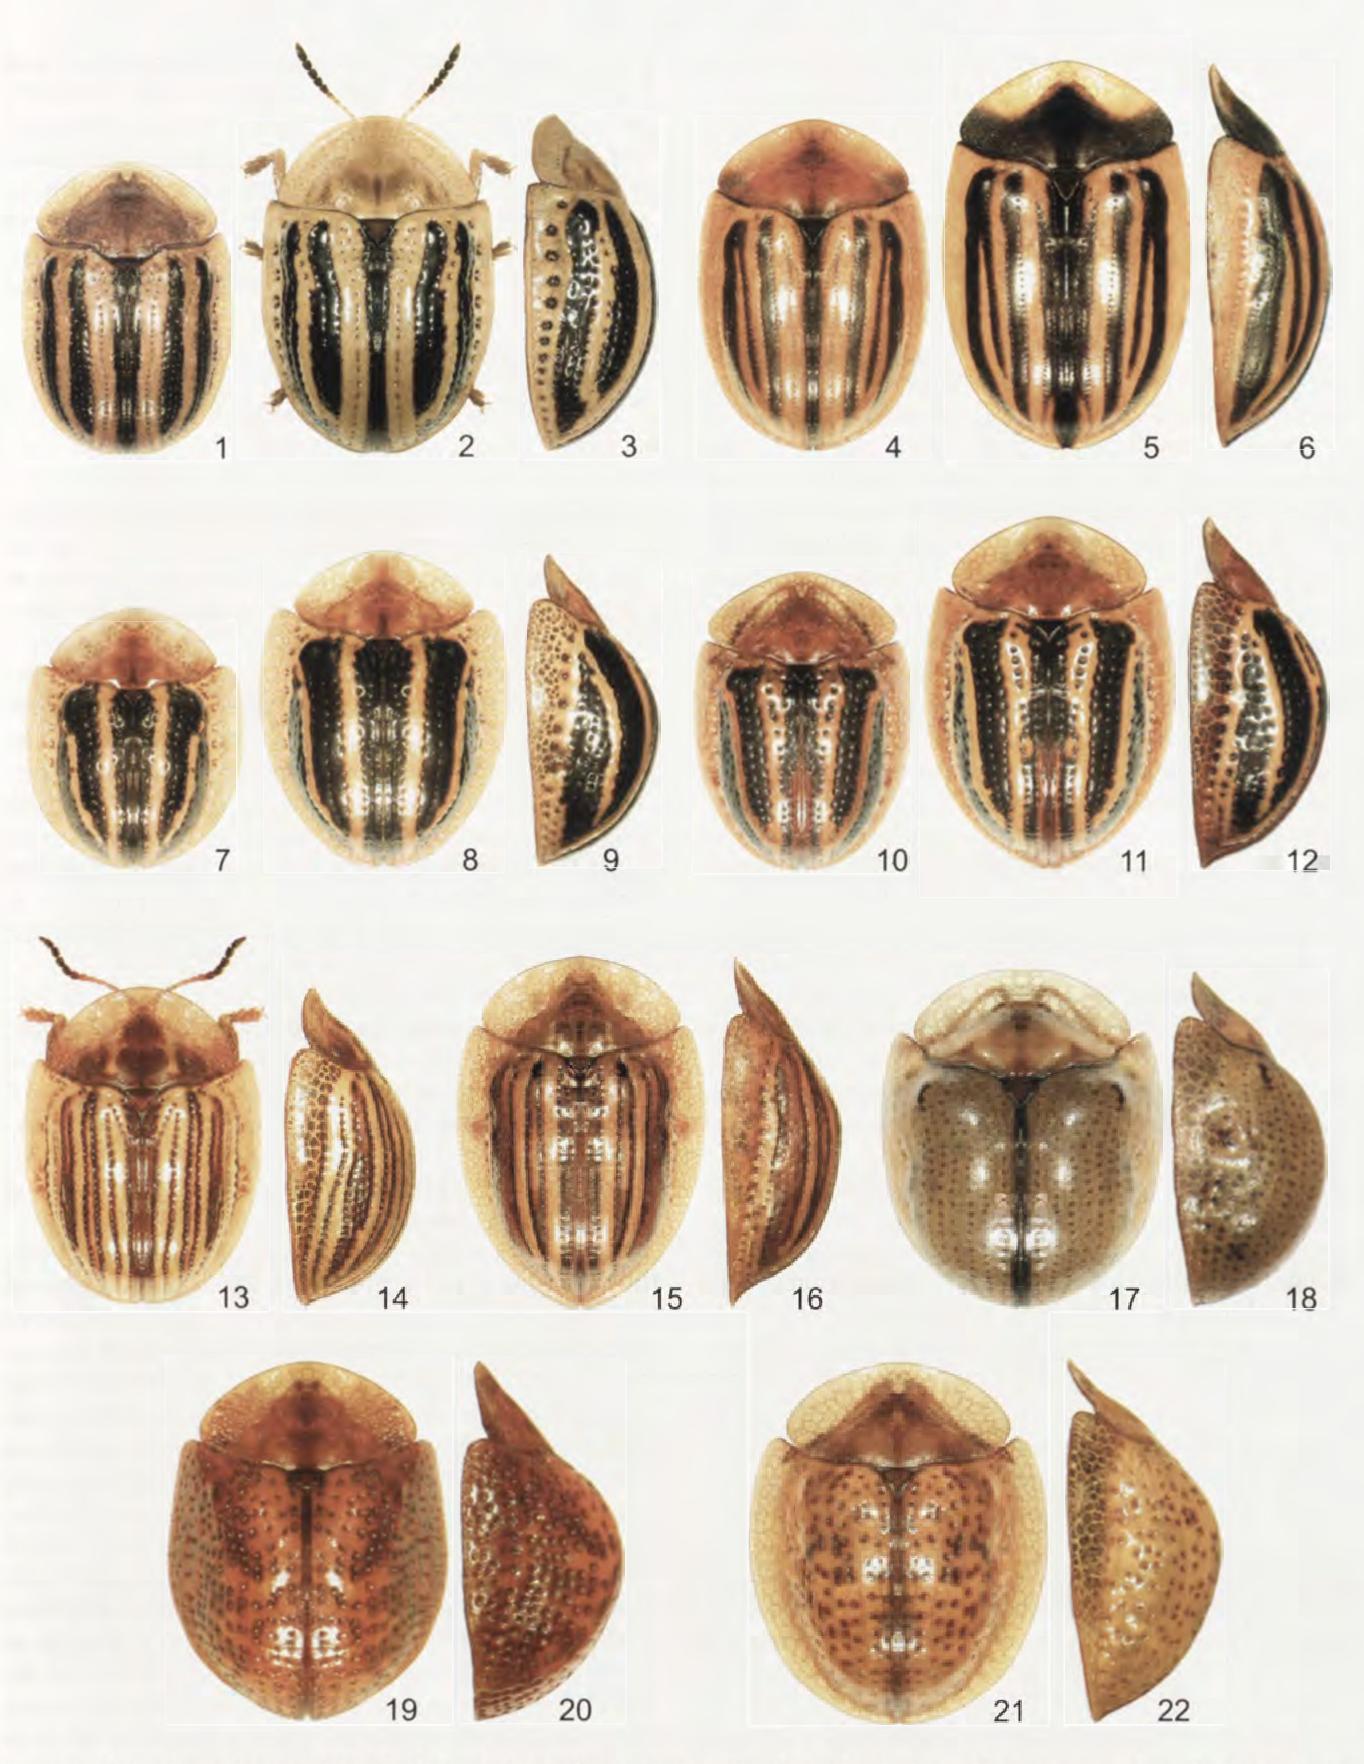 figure 1-22